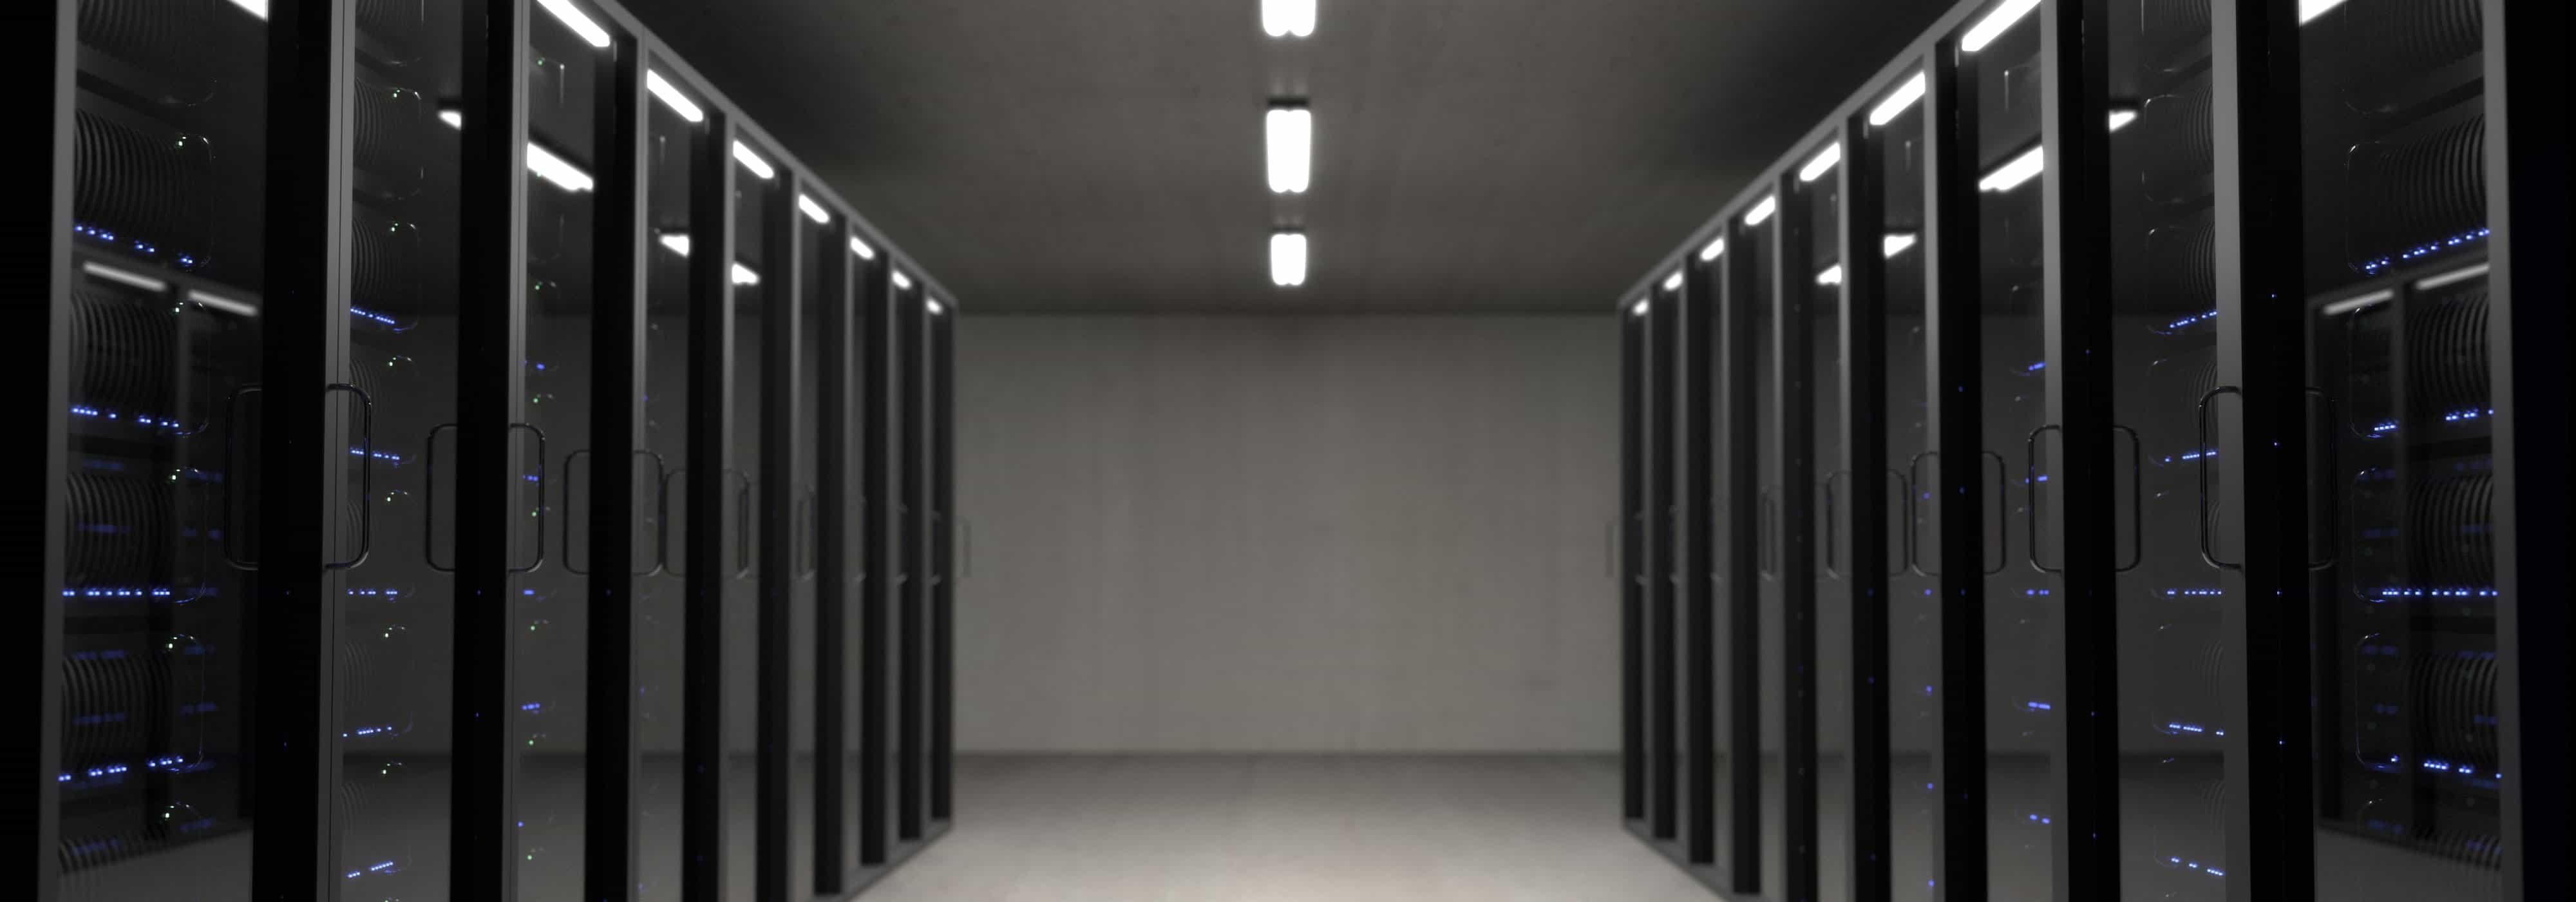 Data center colocation servers or stacks